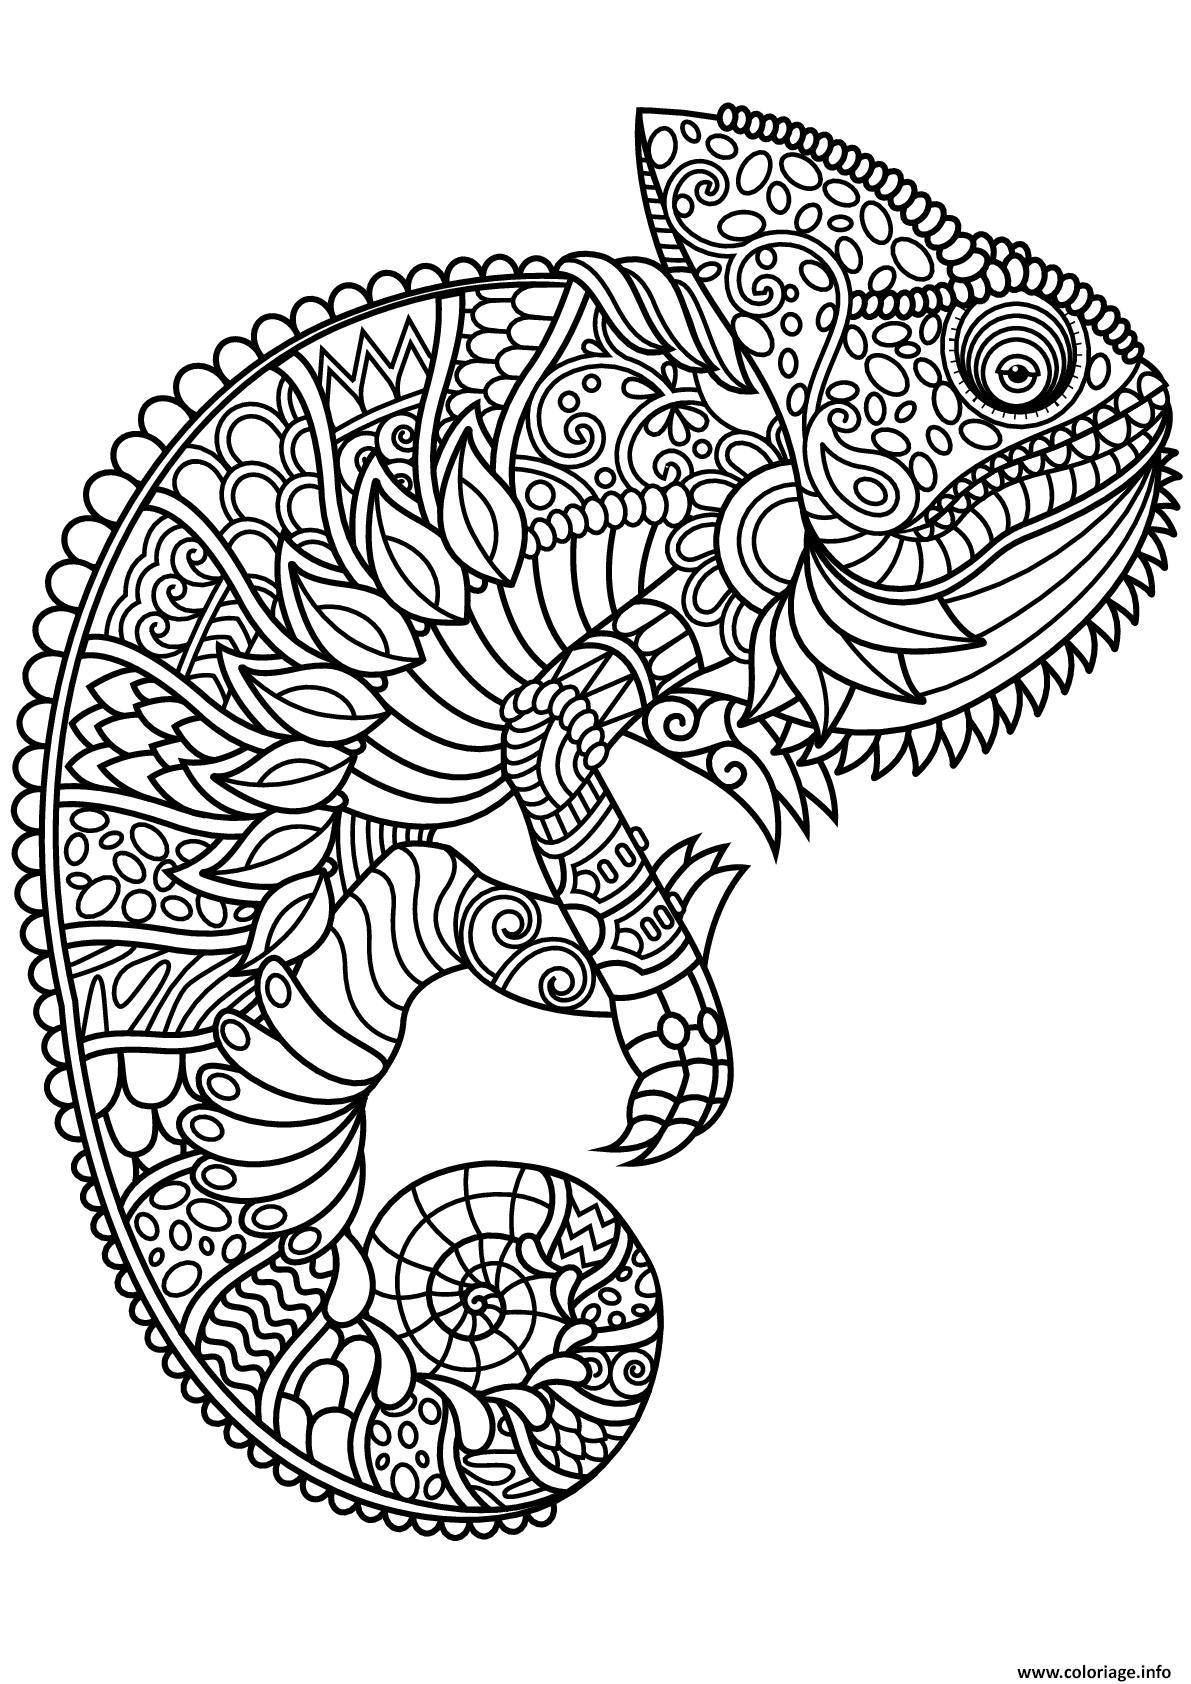 Dessin mandala cameleon Coloriage Gratuit à Imprimer